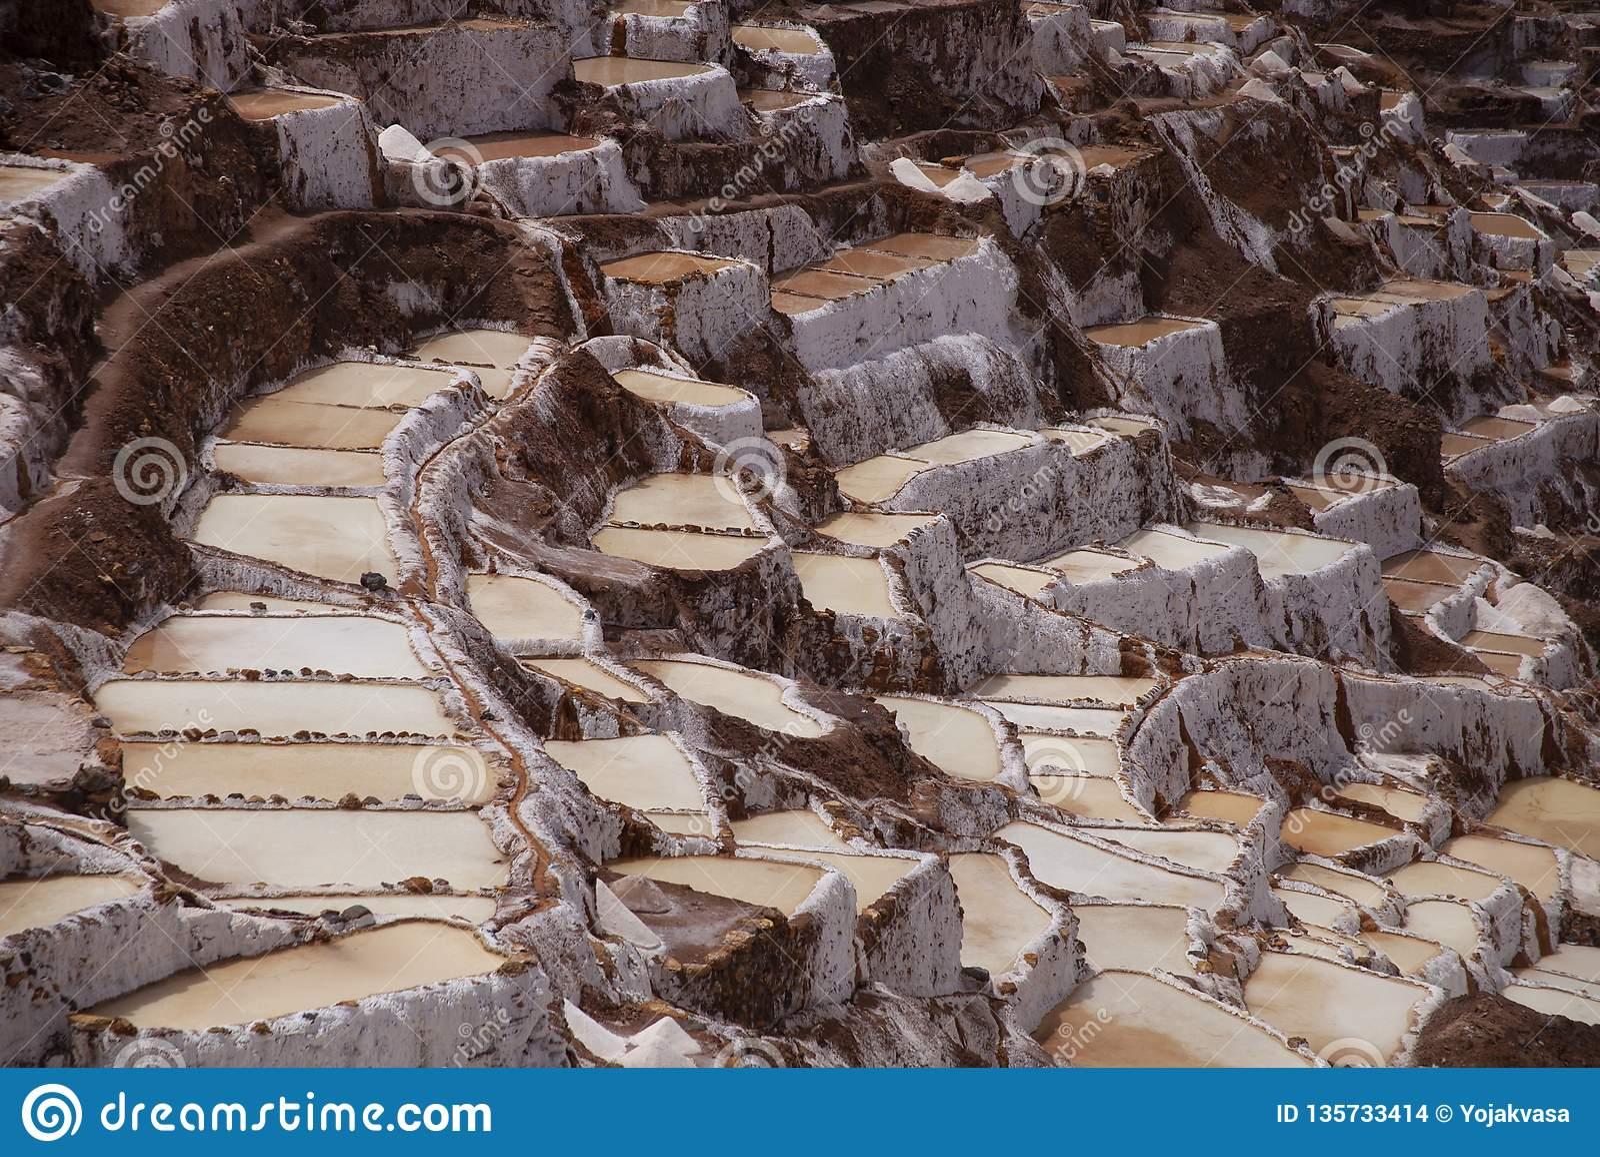 Incan Outdoor salt mine in the Andes, peru